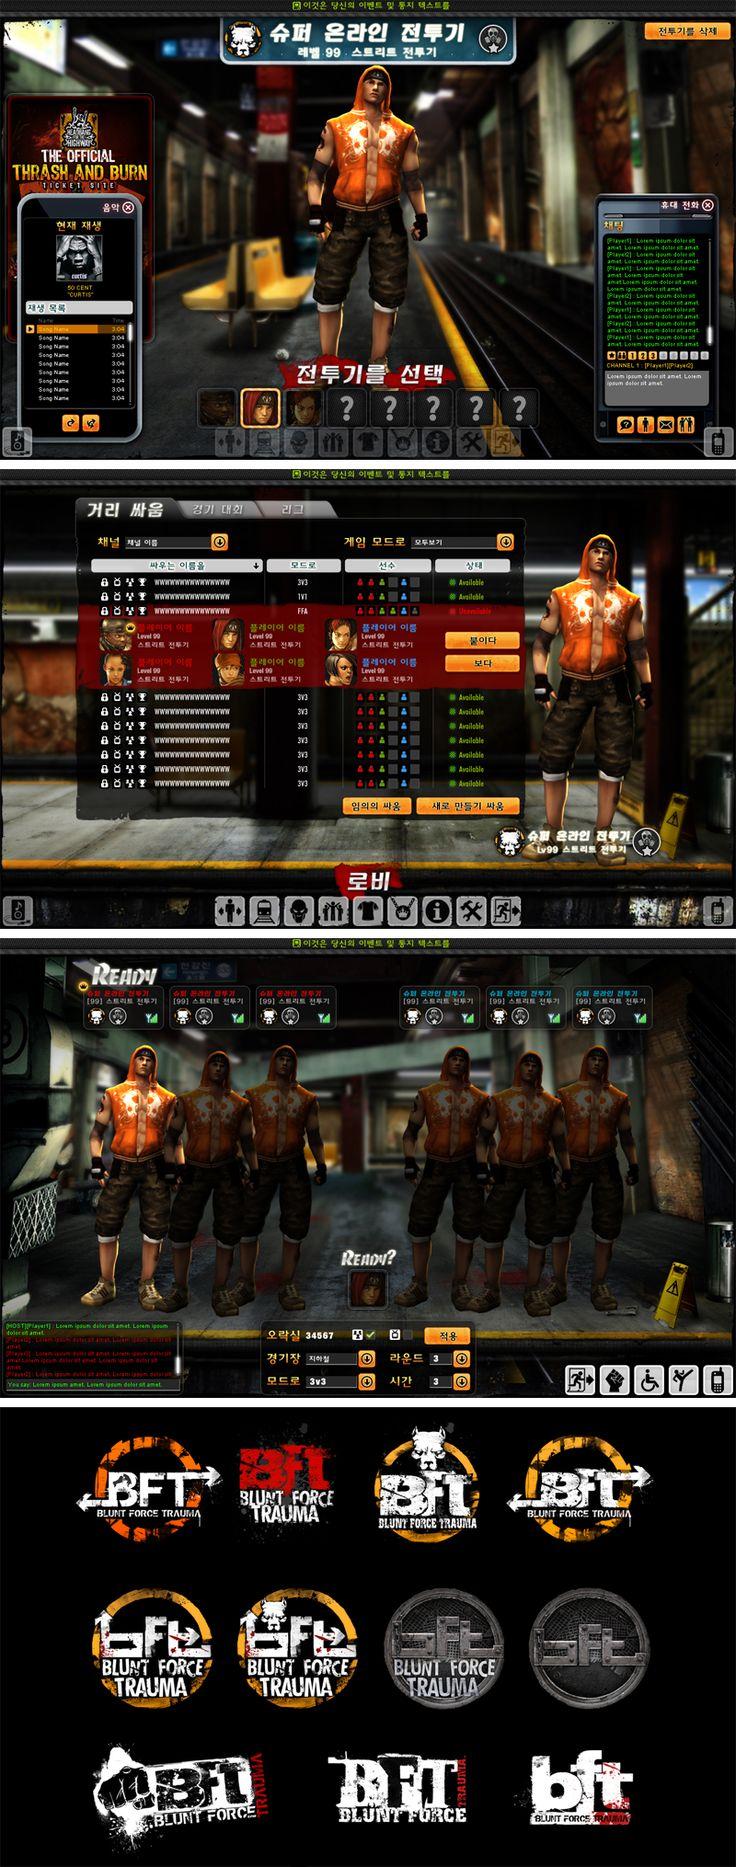 PC Game UI - BFT by ~Cashong on deviantART